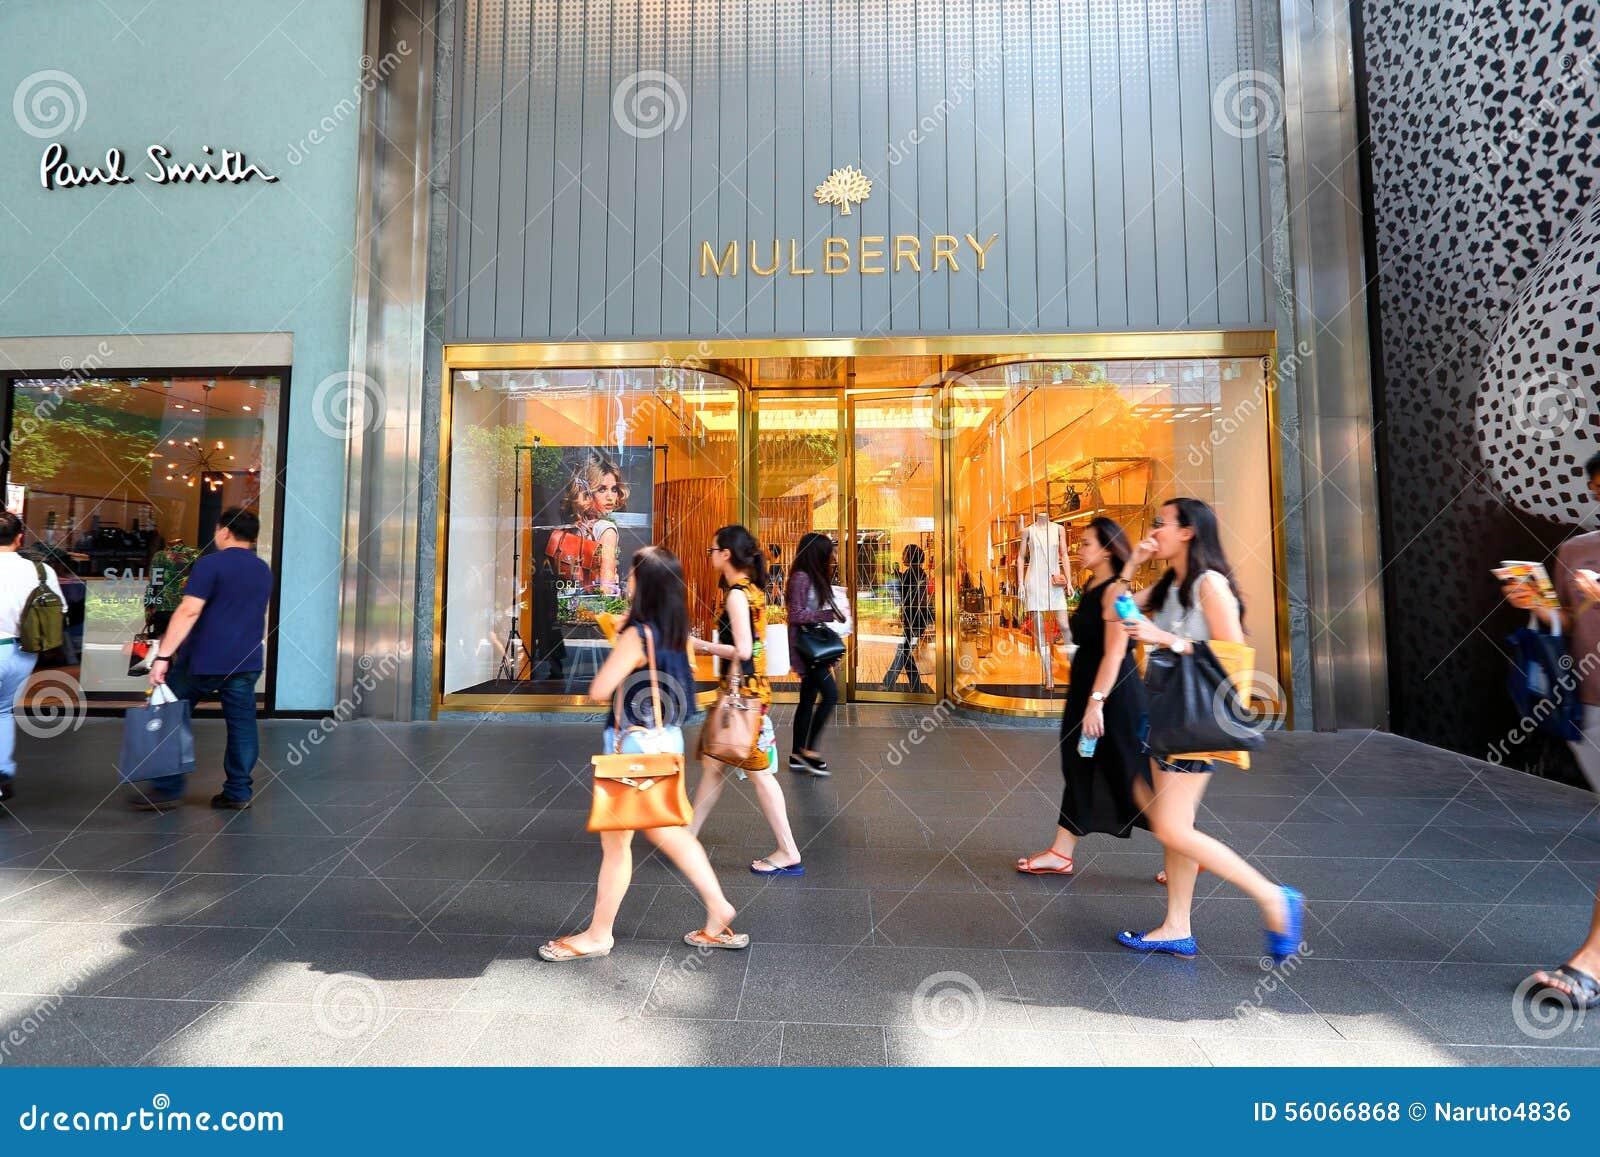 Singapore: Mulberry retail store